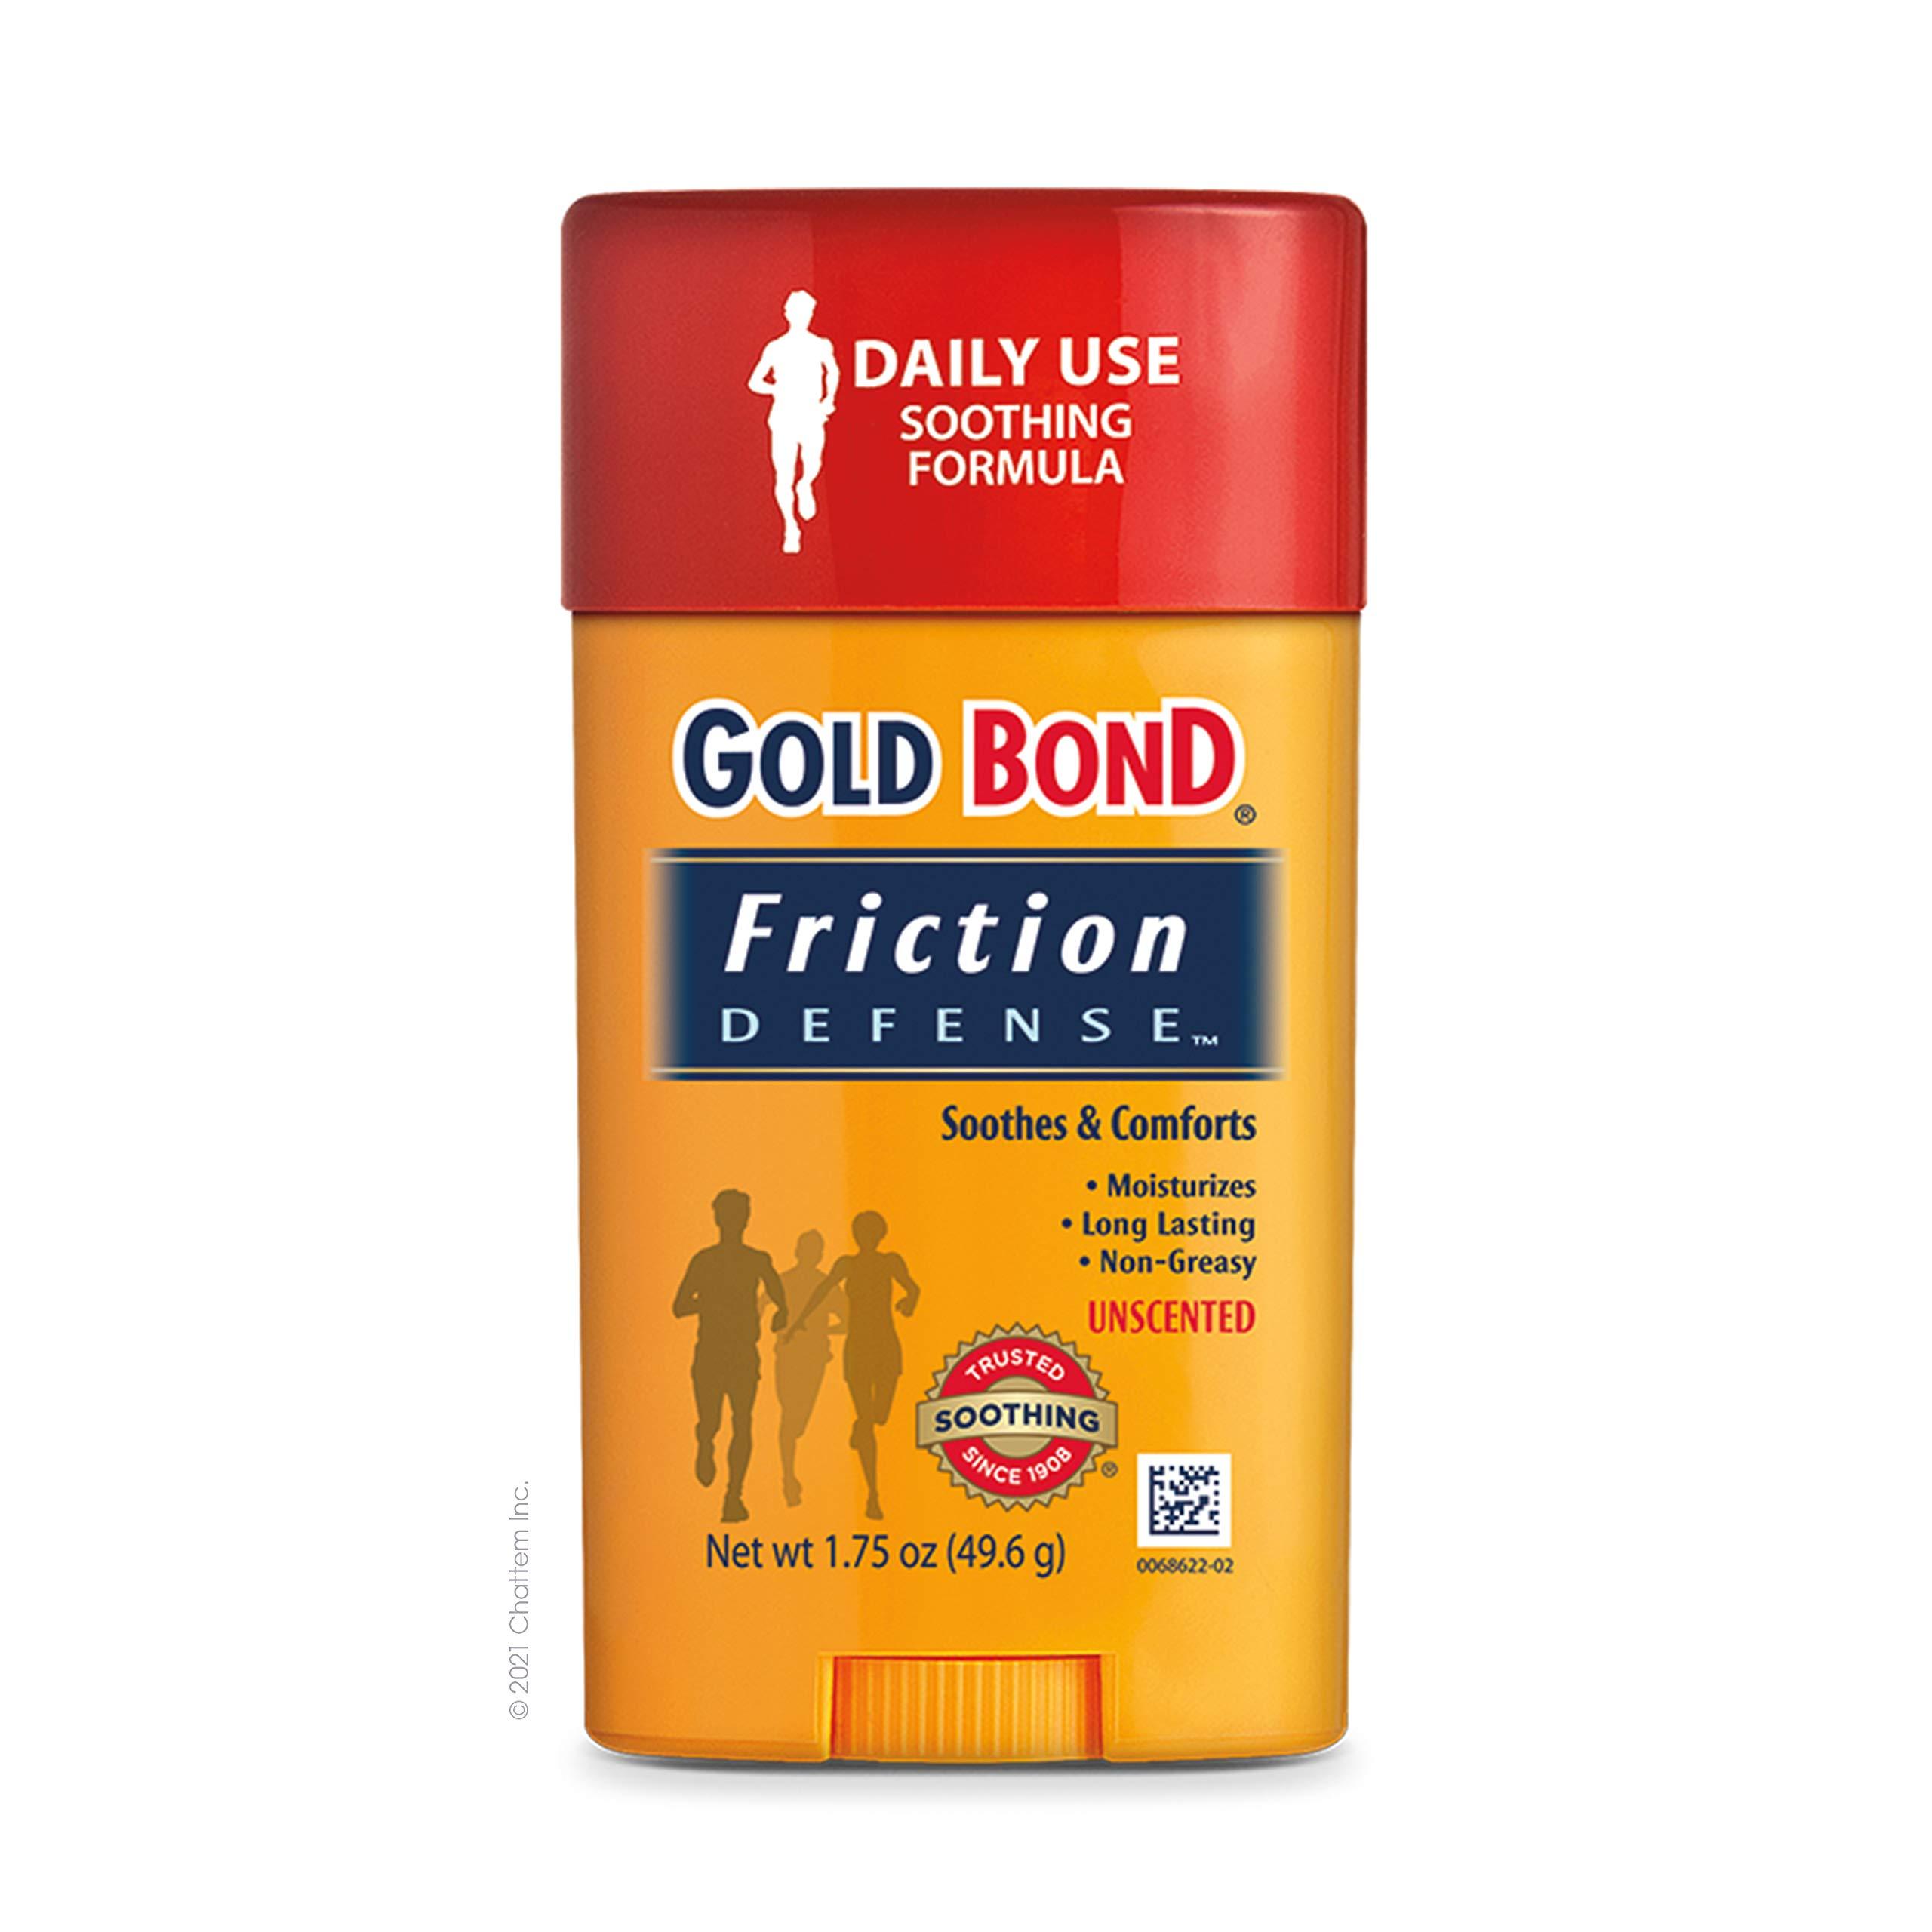 Gold Bond Friction Defense Stick, Unscented, 1.75 Ounces